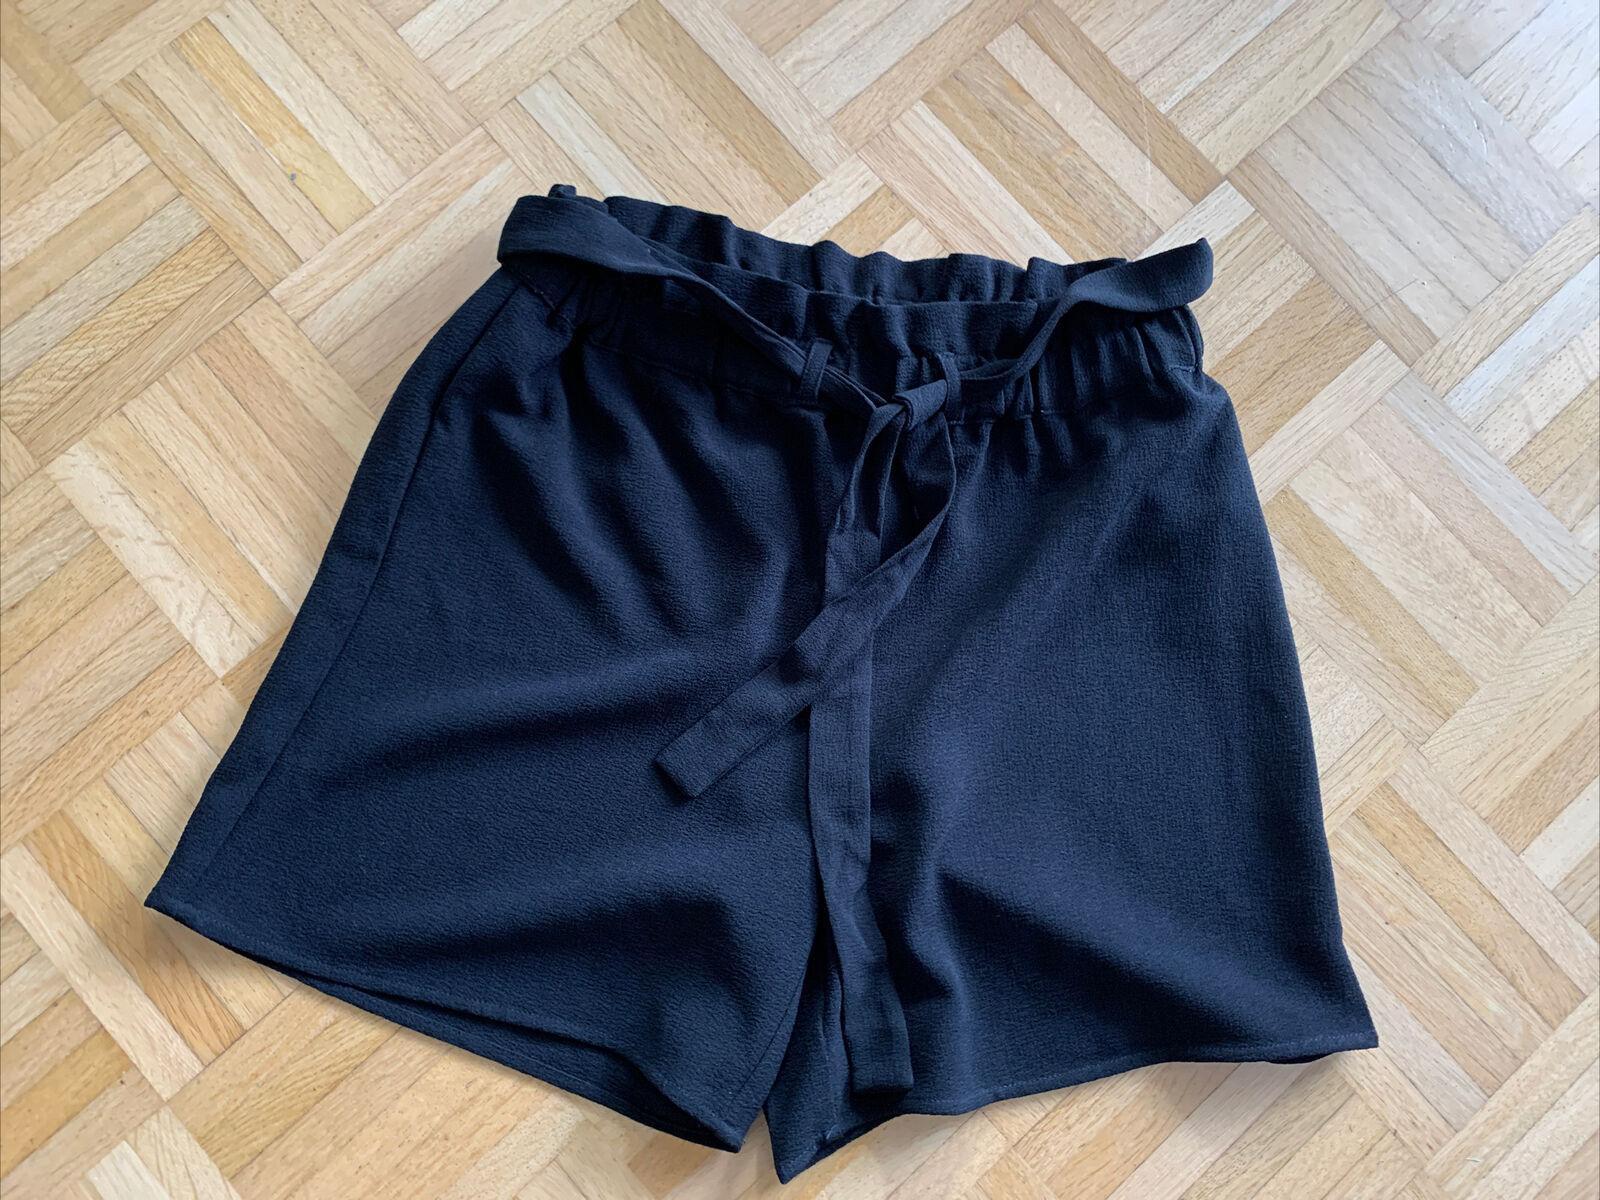 ❤️ Only ❤️ Kurze Damen Hose ❤️ In Schwarz ❤️ Gr 38 ❤️